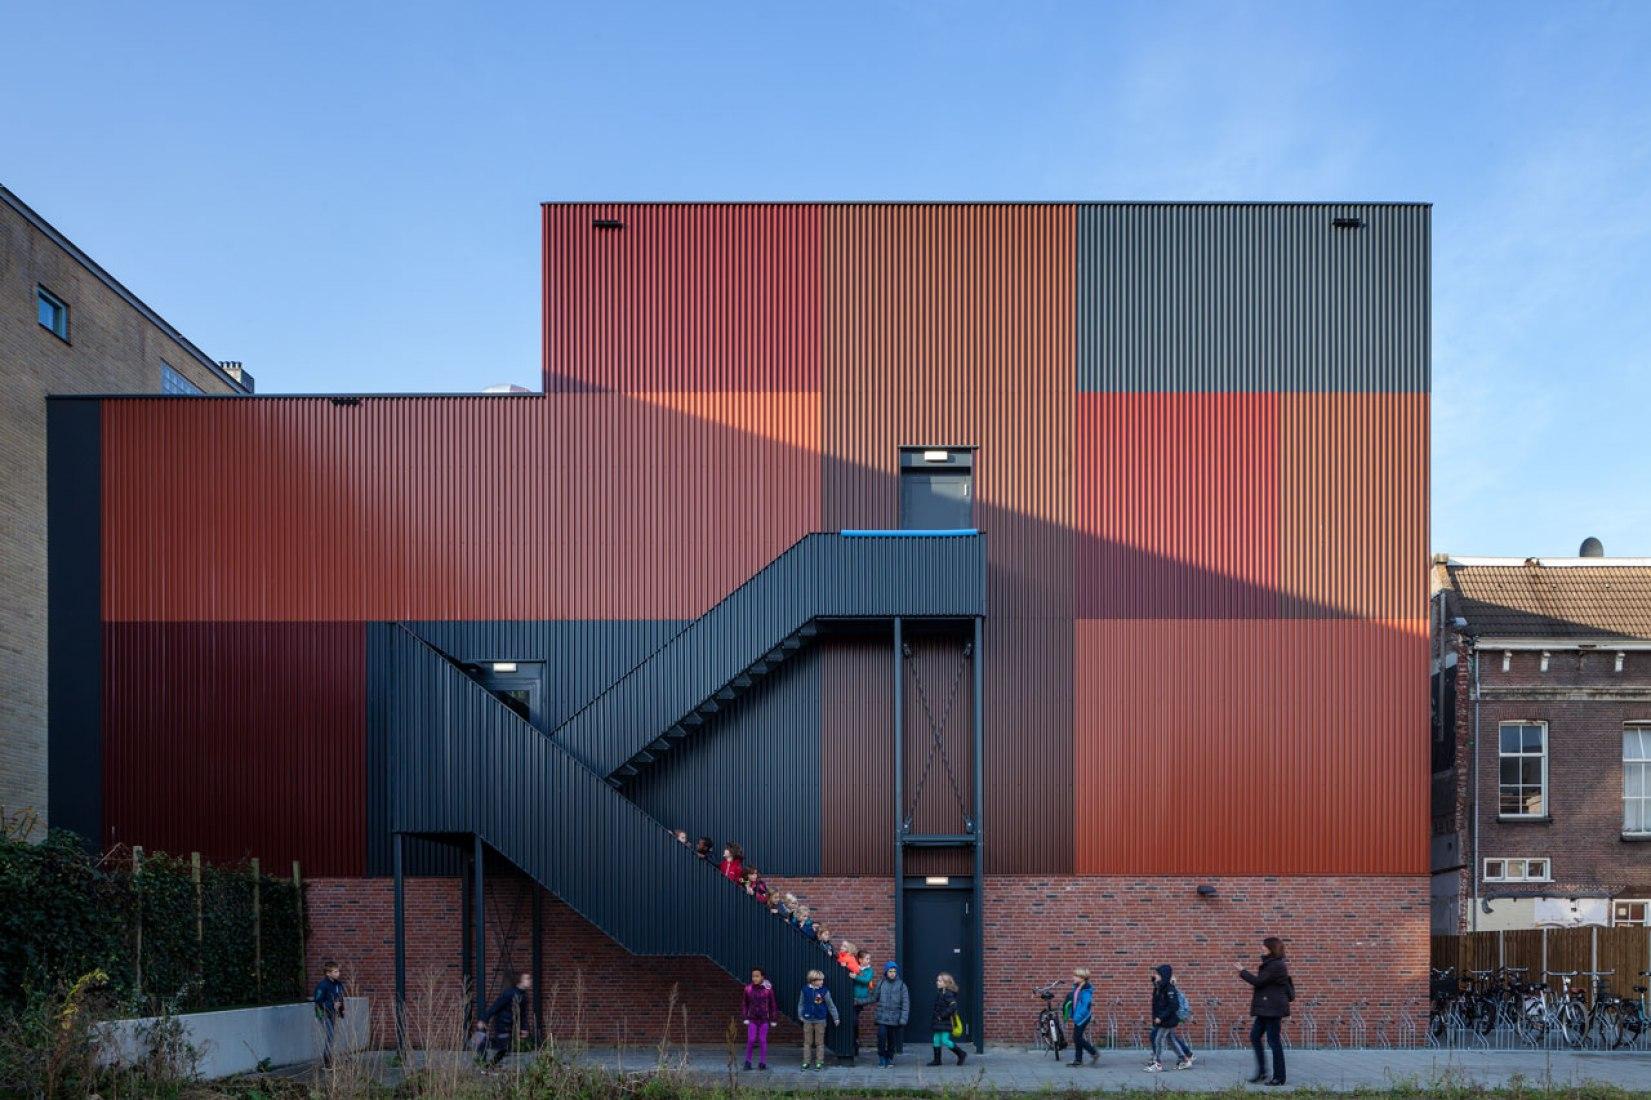 Polideportivo Groningen por Marlies Rohmer Architects & Urbanists. Fotografía © Daria Scagliola / Stijn Brakkee.